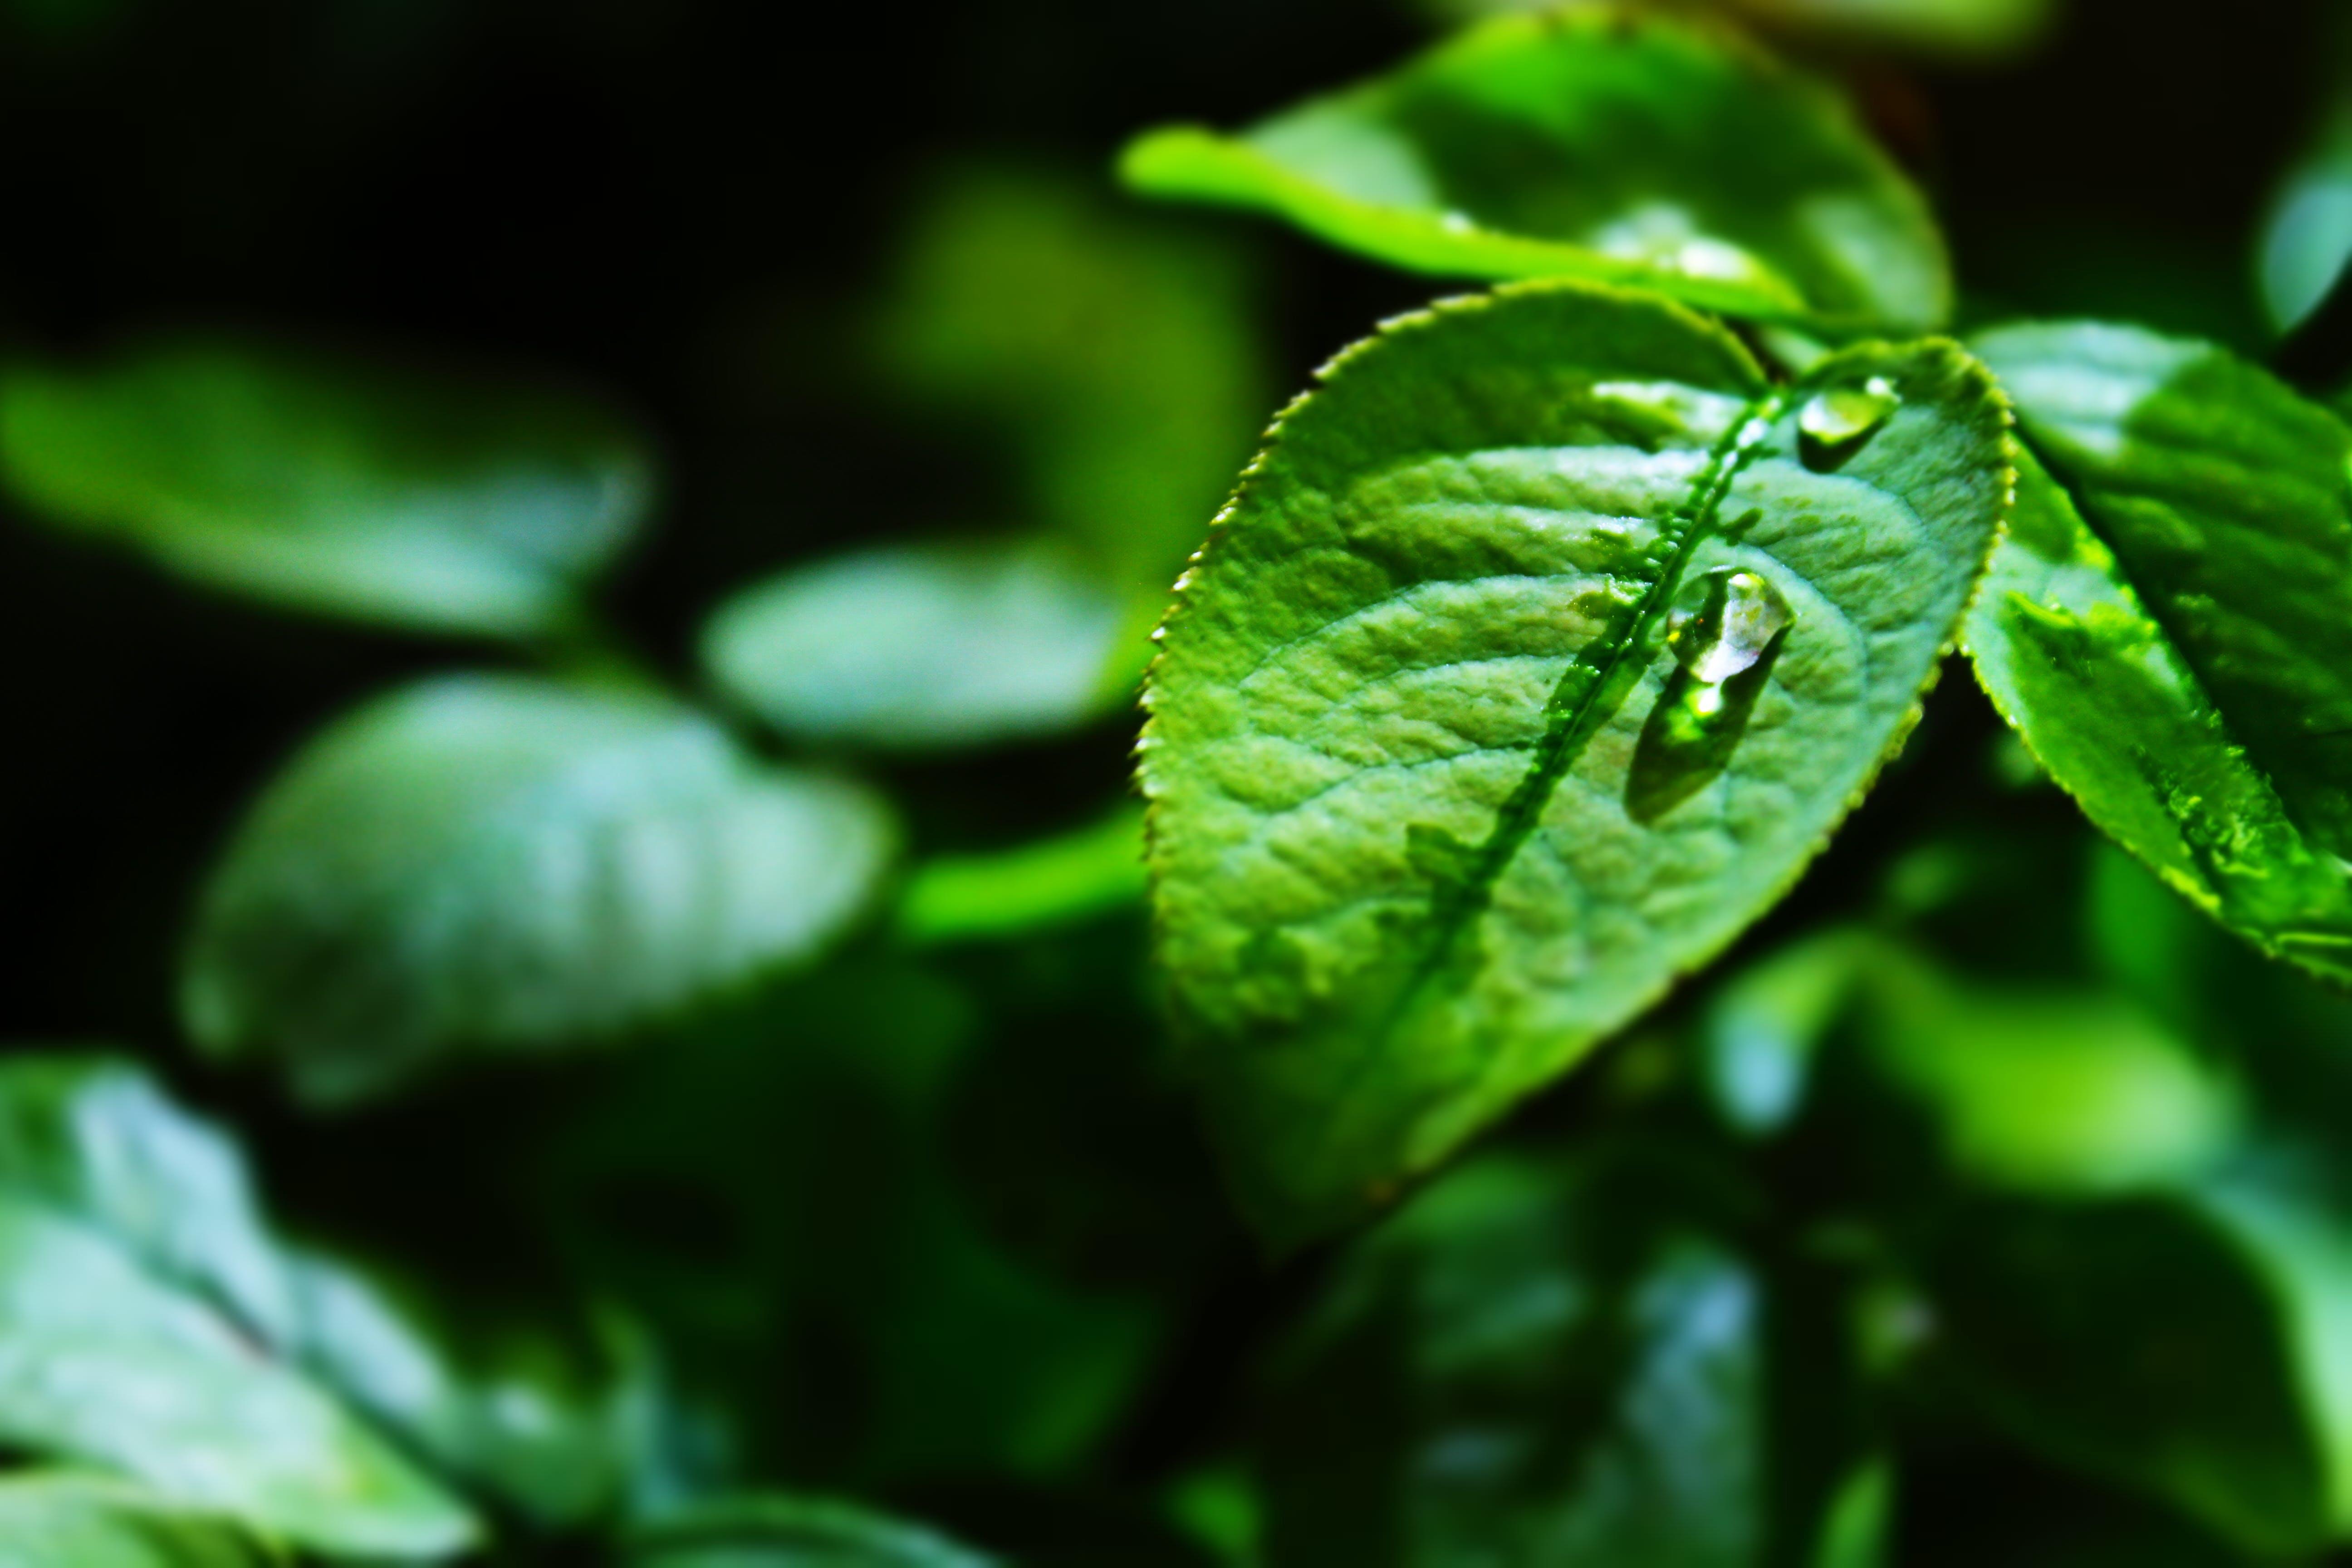 Green Leaf on Shallow Focus Lens